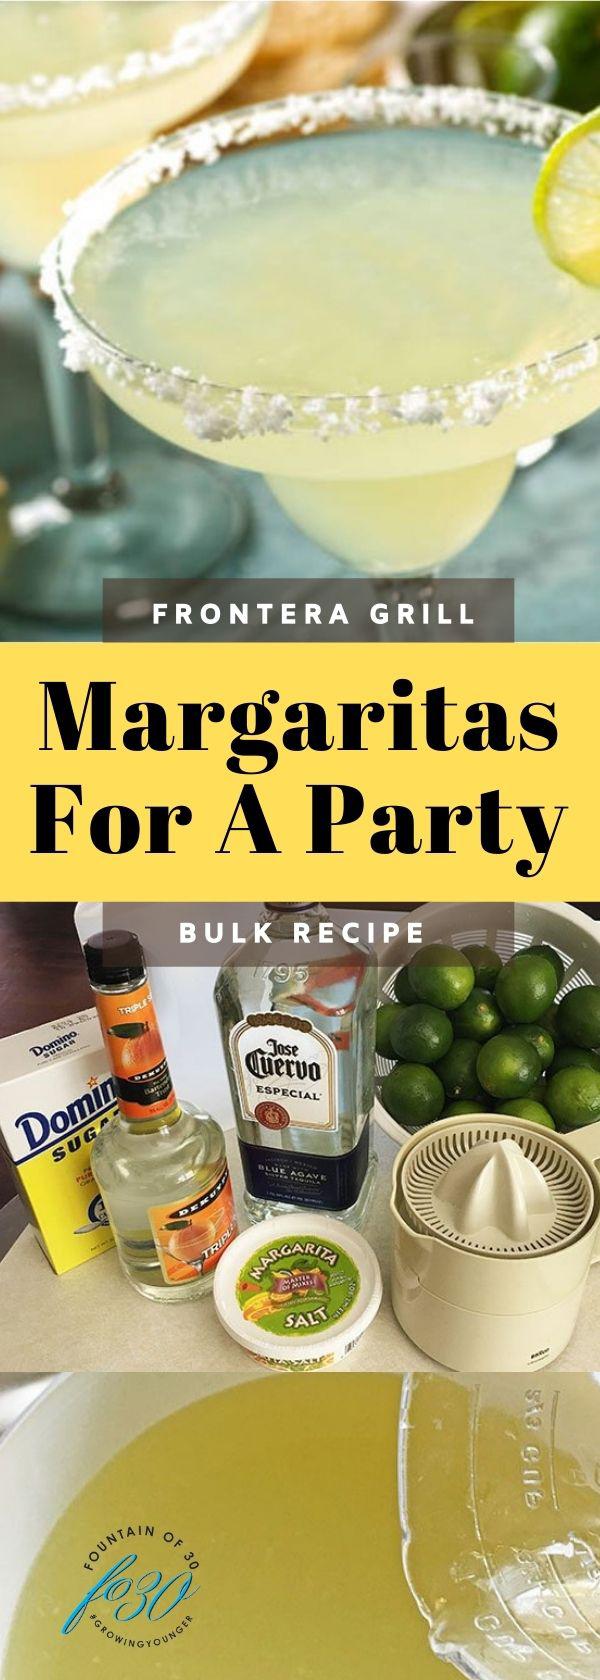 margaritas for a party fountainof30